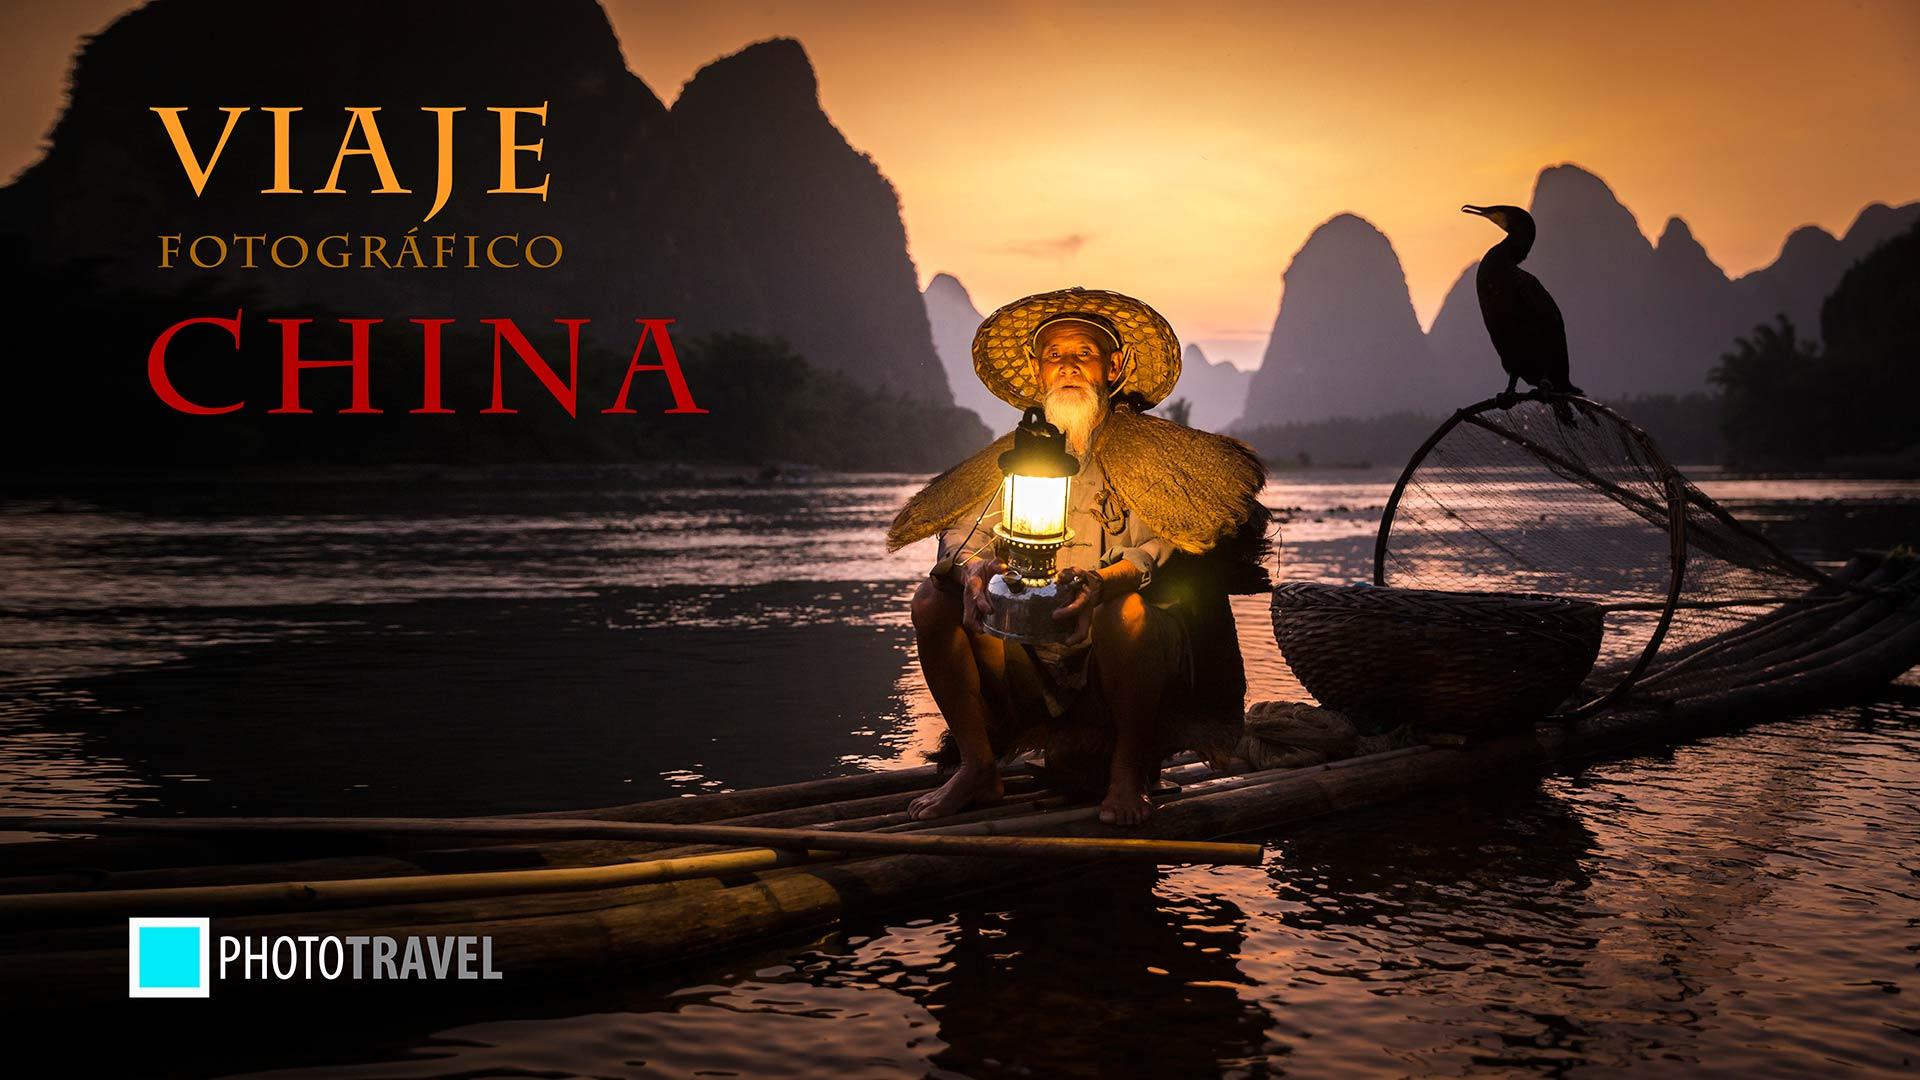 viaje-fotografico-china